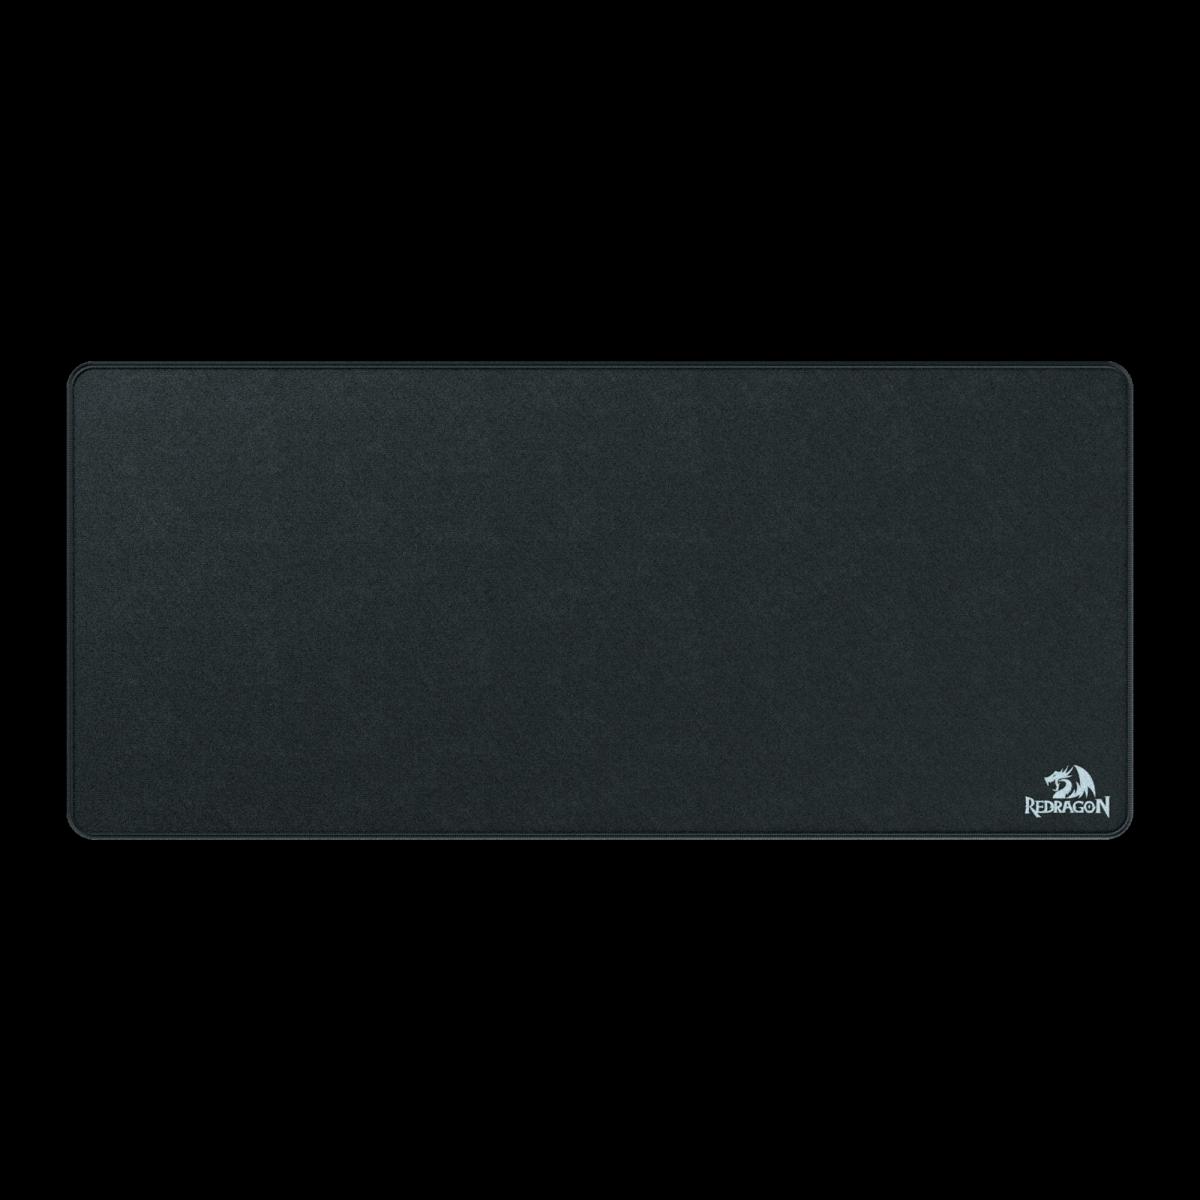 Mousepad Gamer Redragon Flick P032, XL